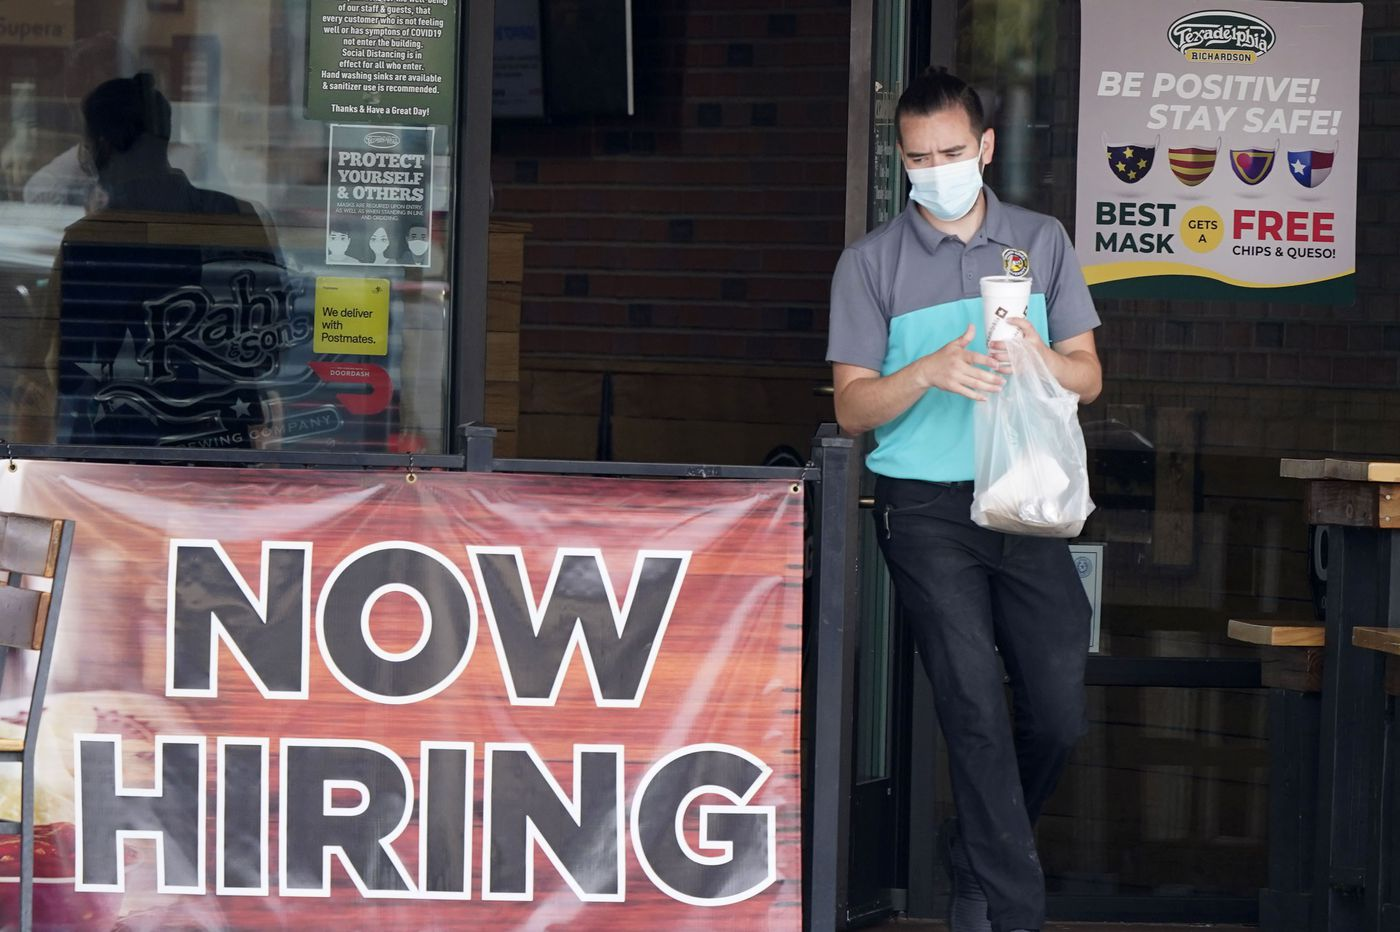 751,000 seek U.S. jobless benefits as COVID-19 hobbles economy